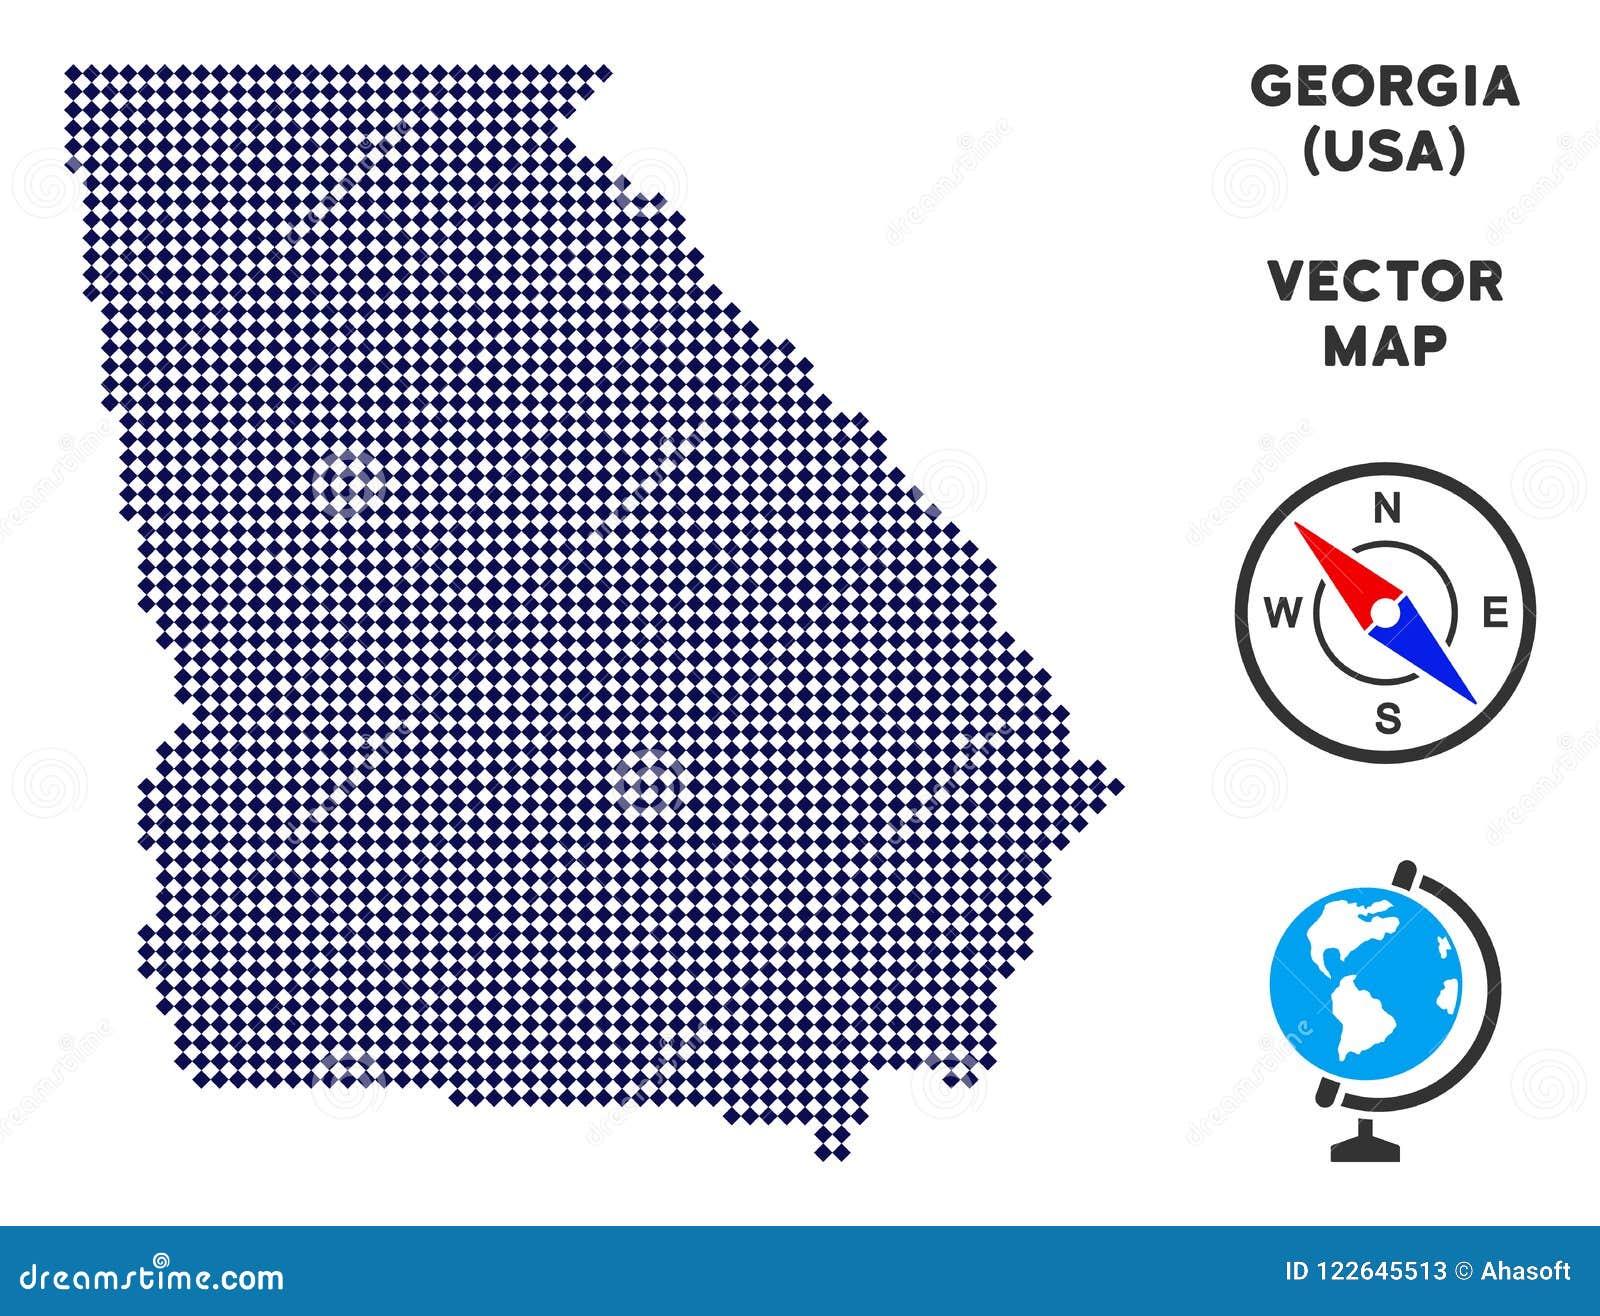 Map Of America Georgia.Pixelated American State Georgia Map Stock Vector Illustration Of